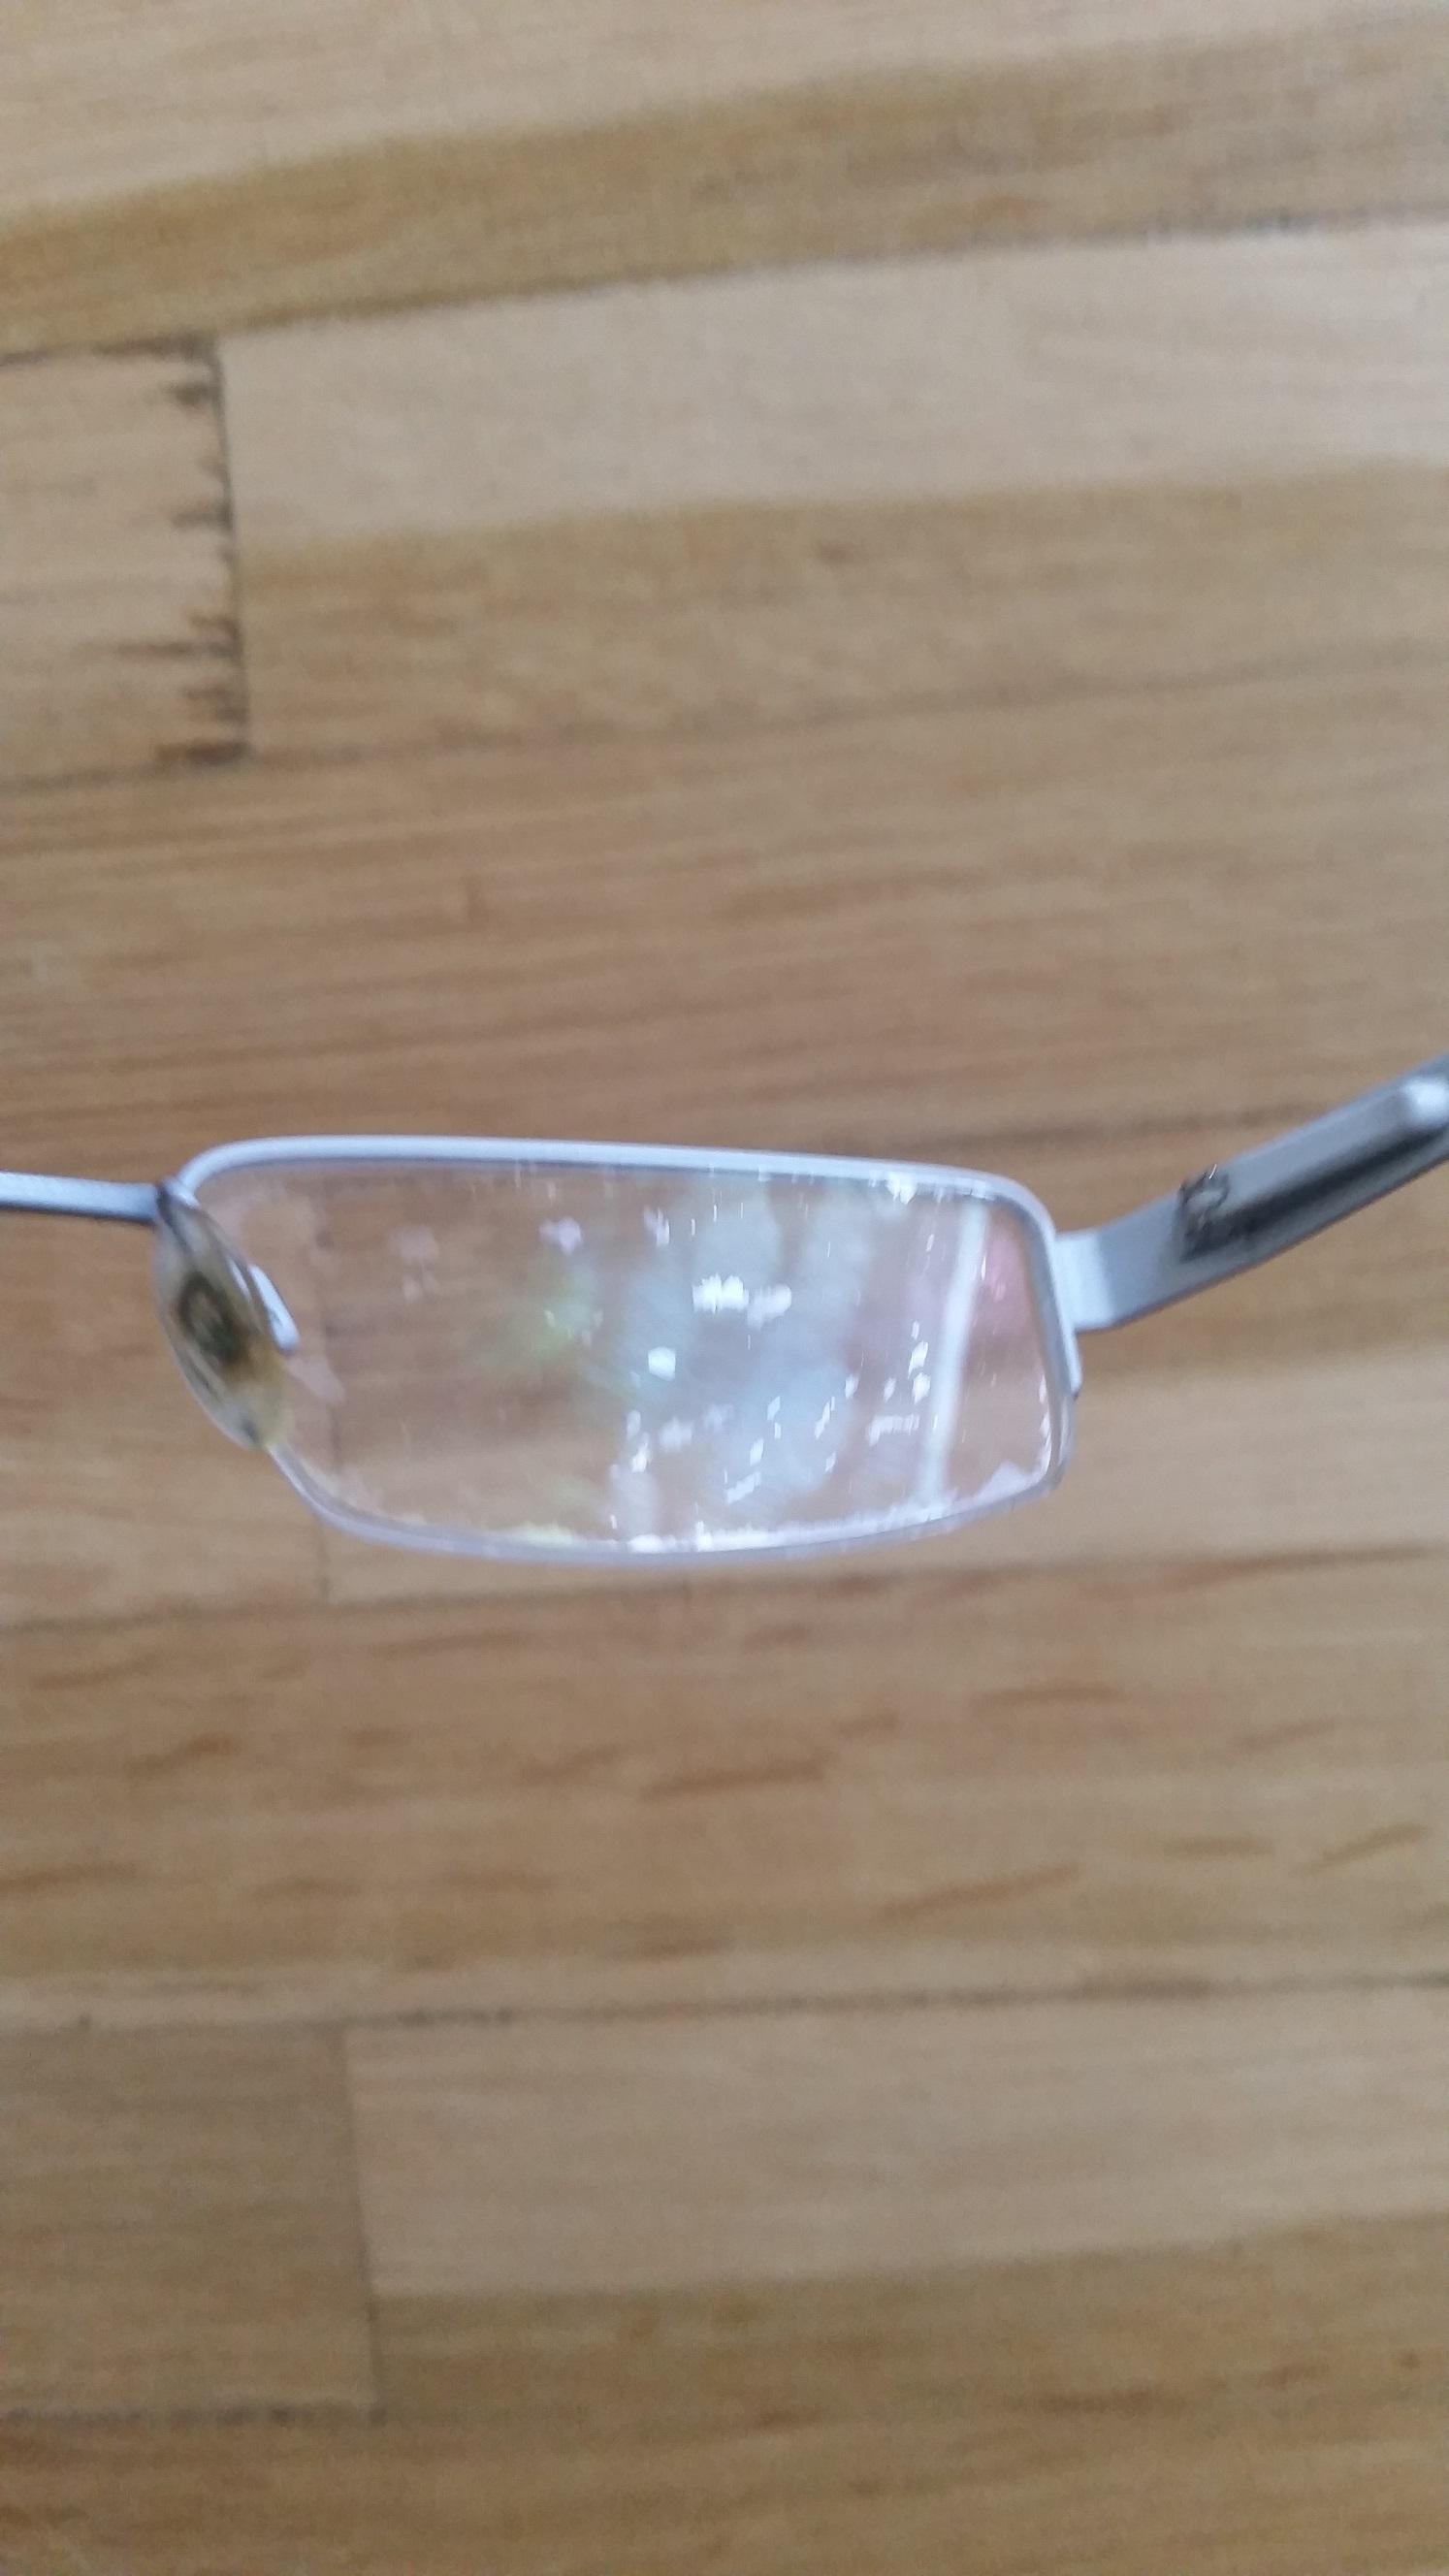 beschichtung brillenglas defekt augen brille glas. Black Bedroom Furniture Sets. Home Design Ideas